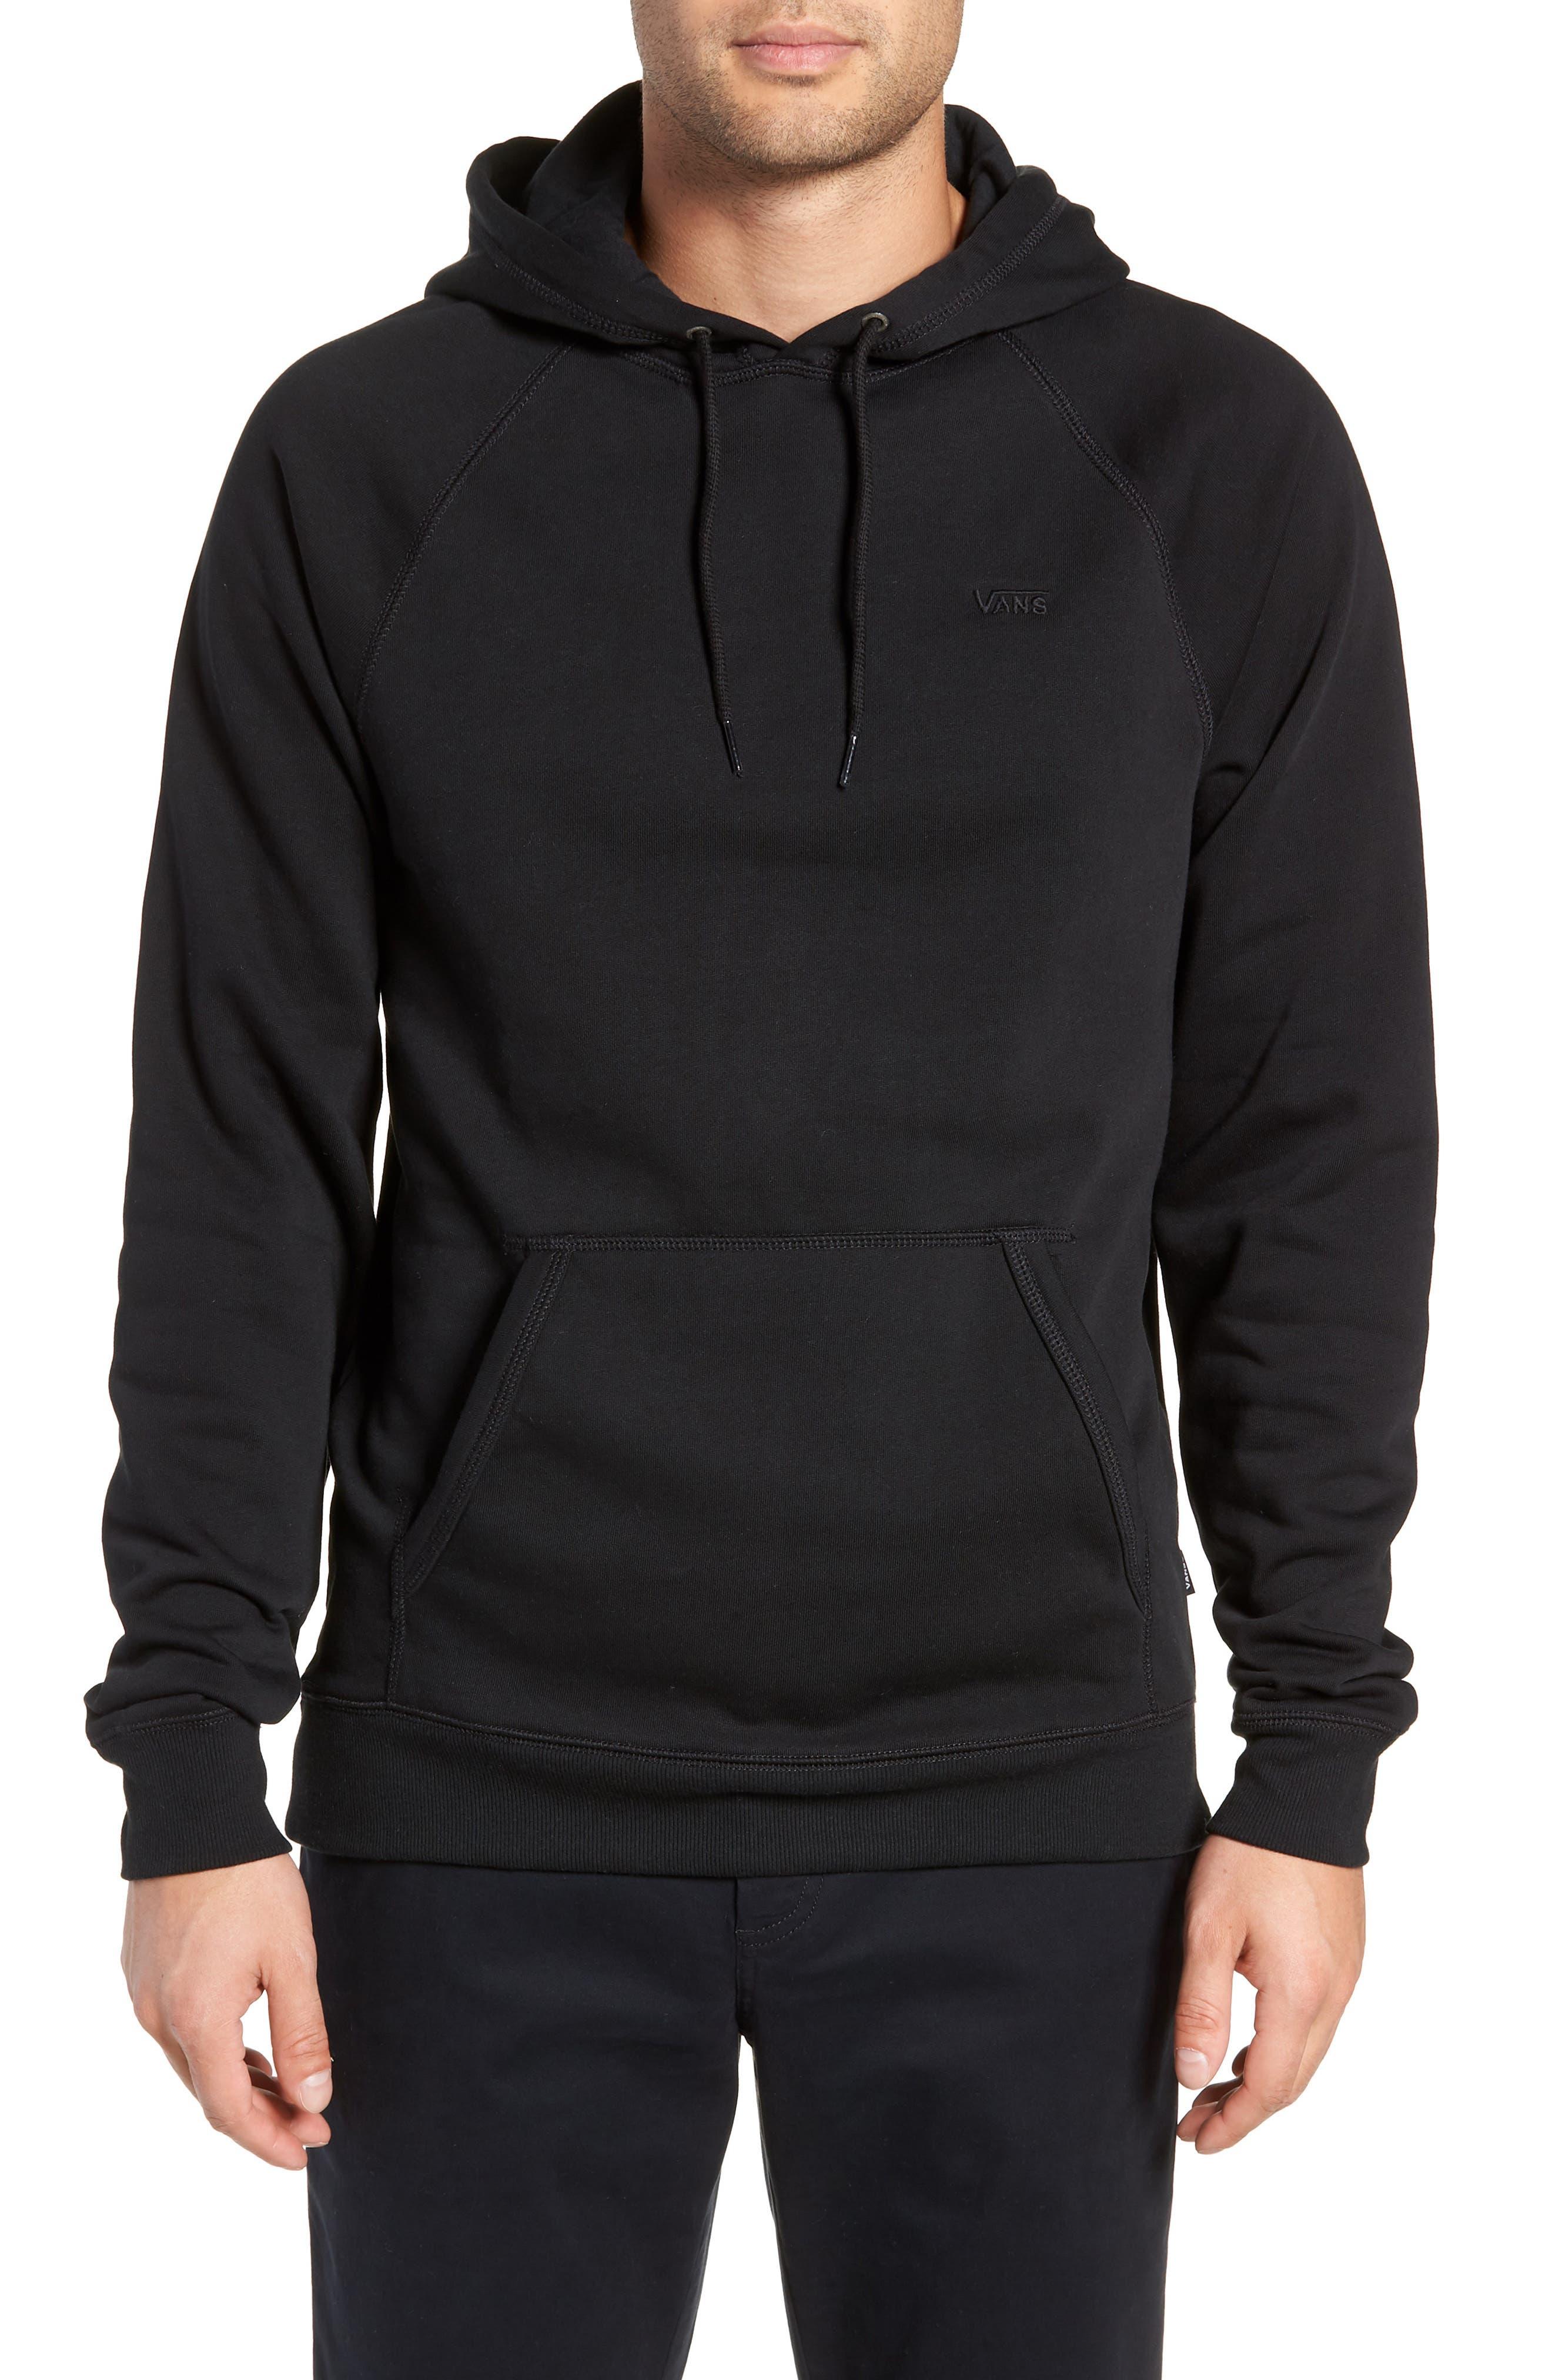 Versa Hoodie Sweatshirt,                             Main thumbnail 1, color,                             BLACK